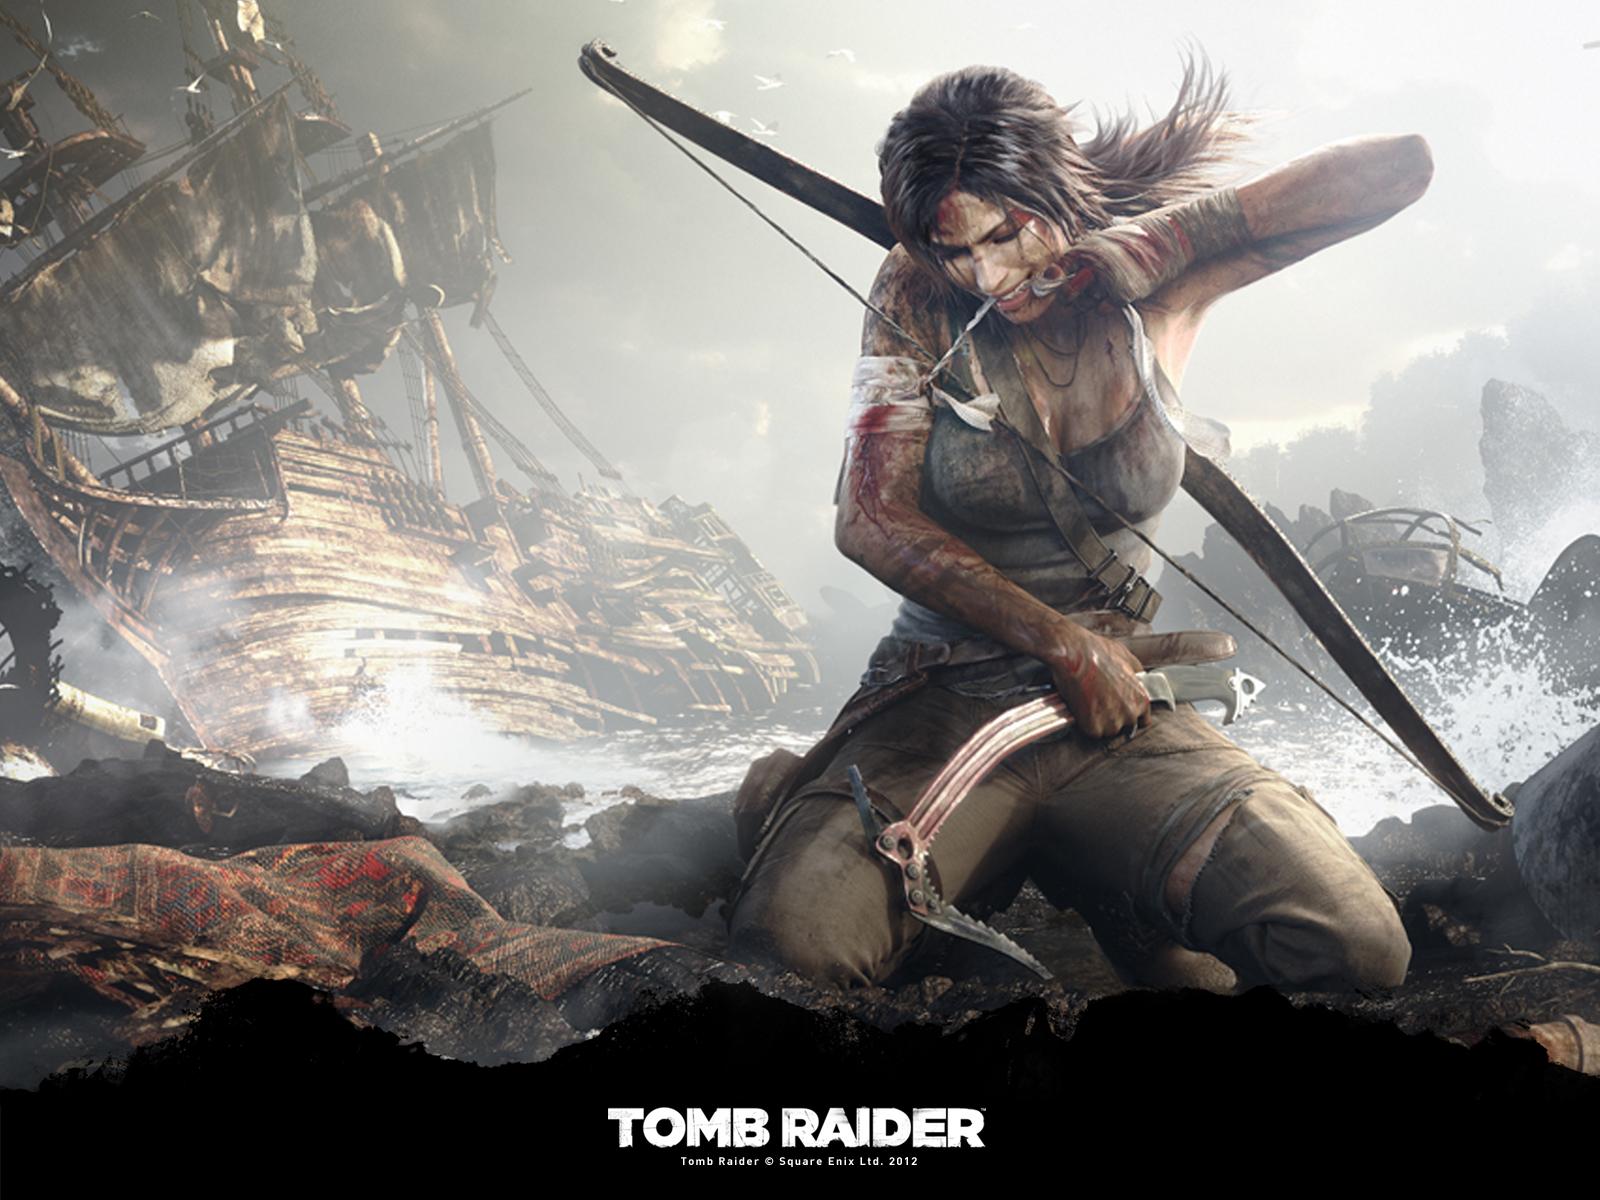 Tomb raider 2012 crystal dynamics square enix game